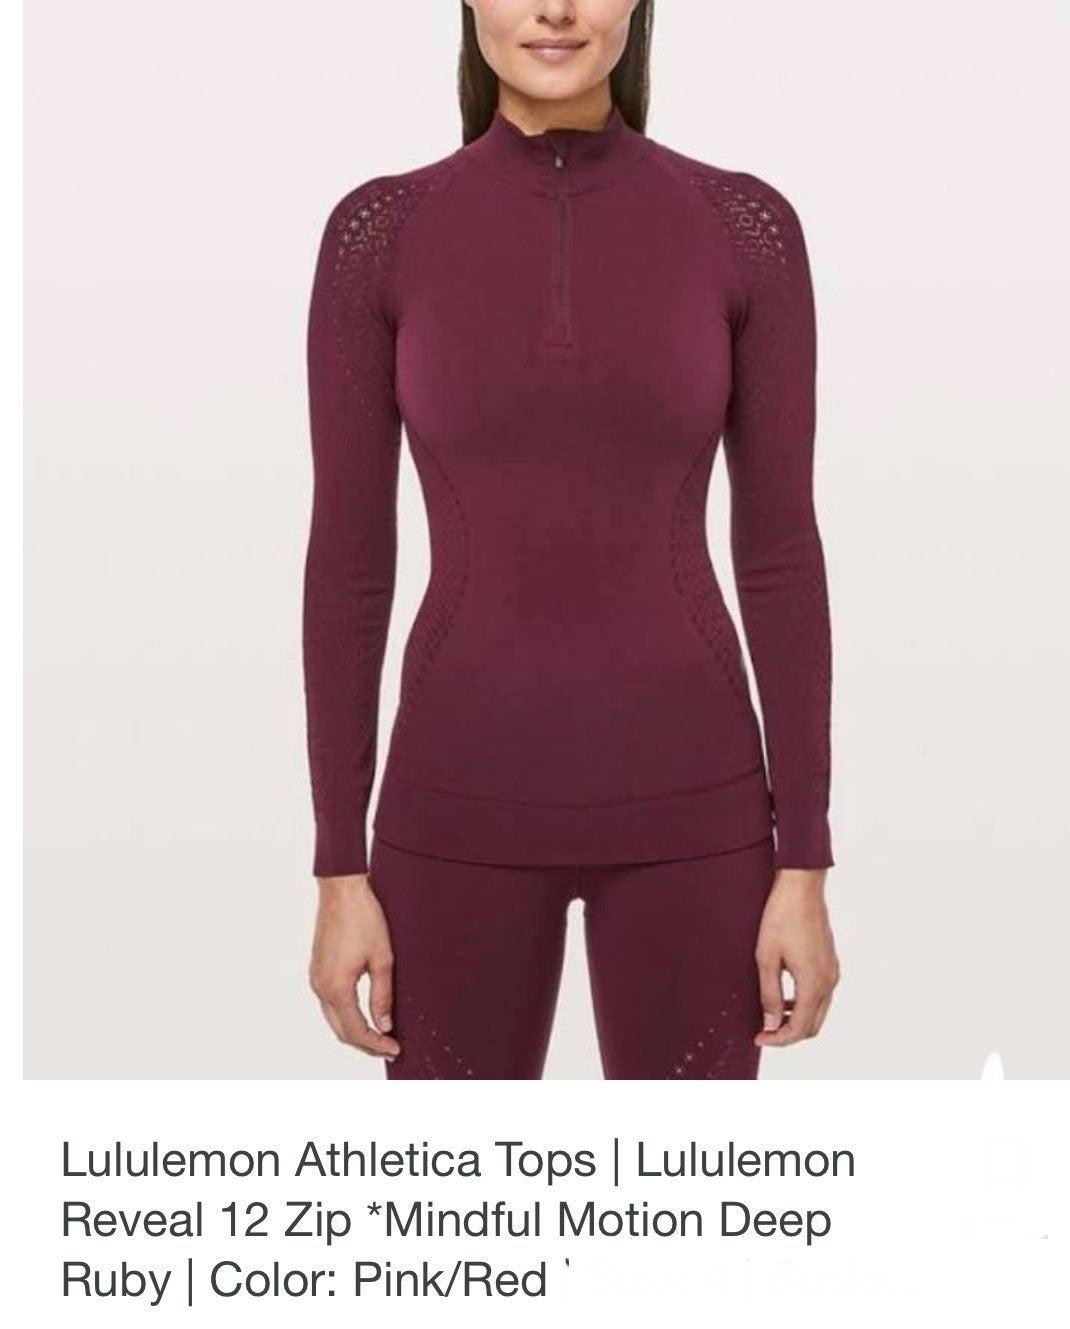 Lululemon 1/2 Zip Reveal Top